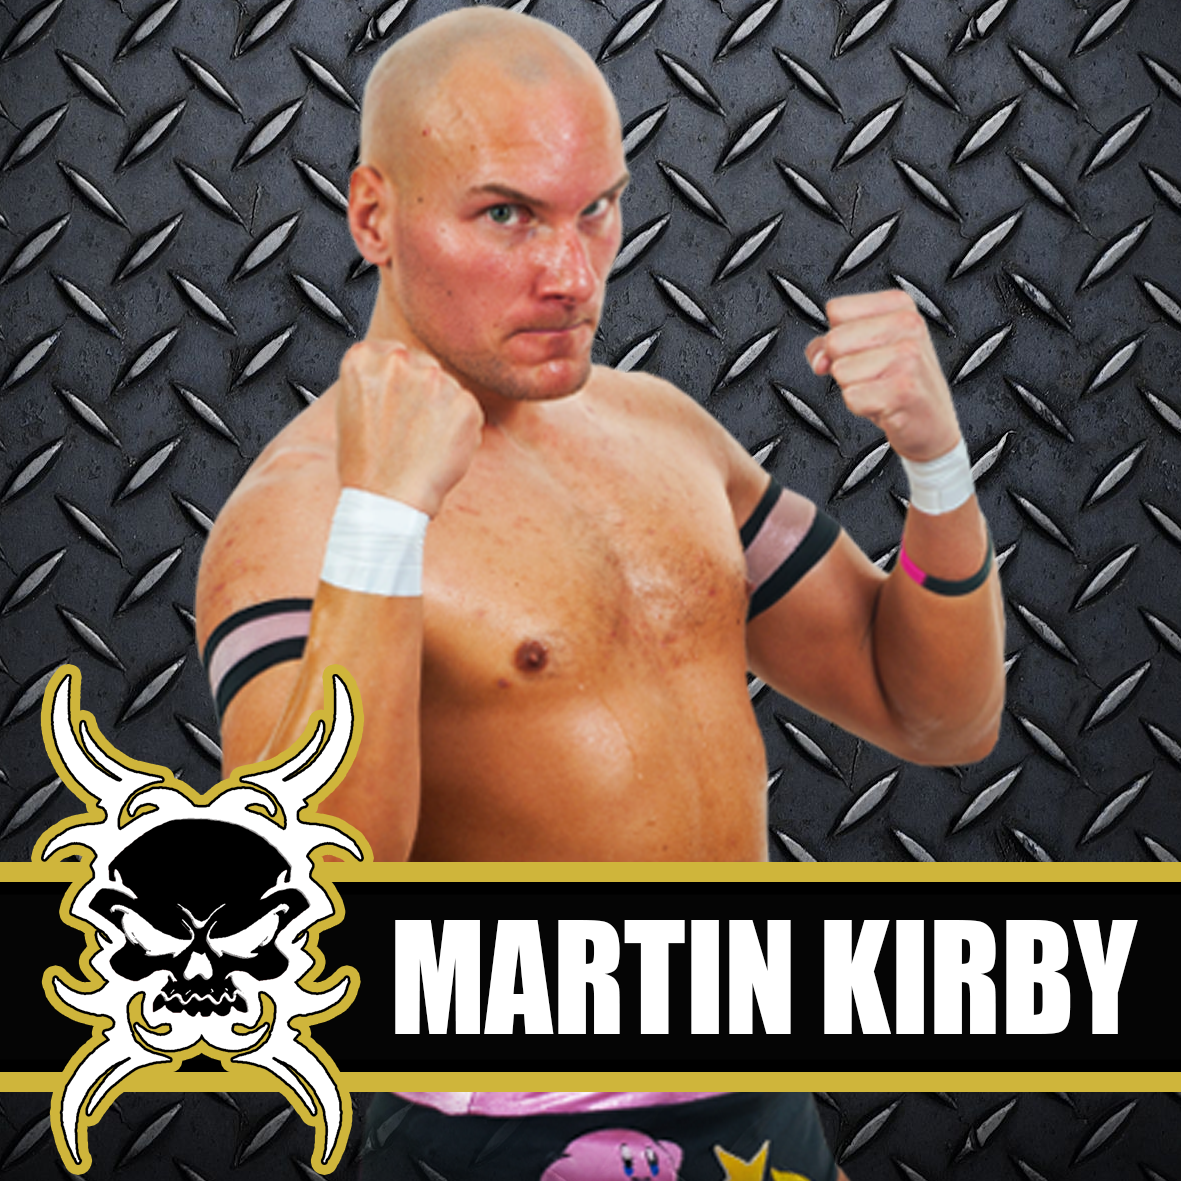 Martin Kirby